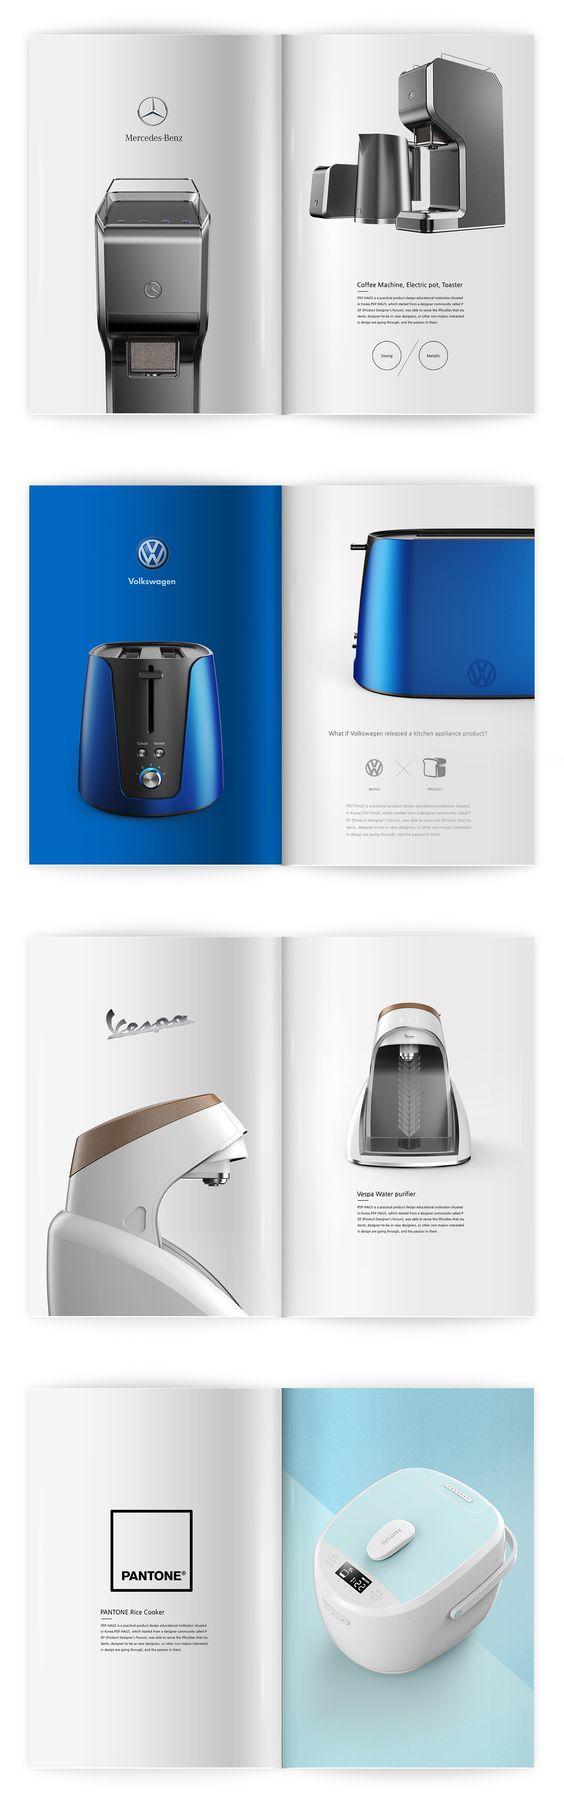 folleto producto 2